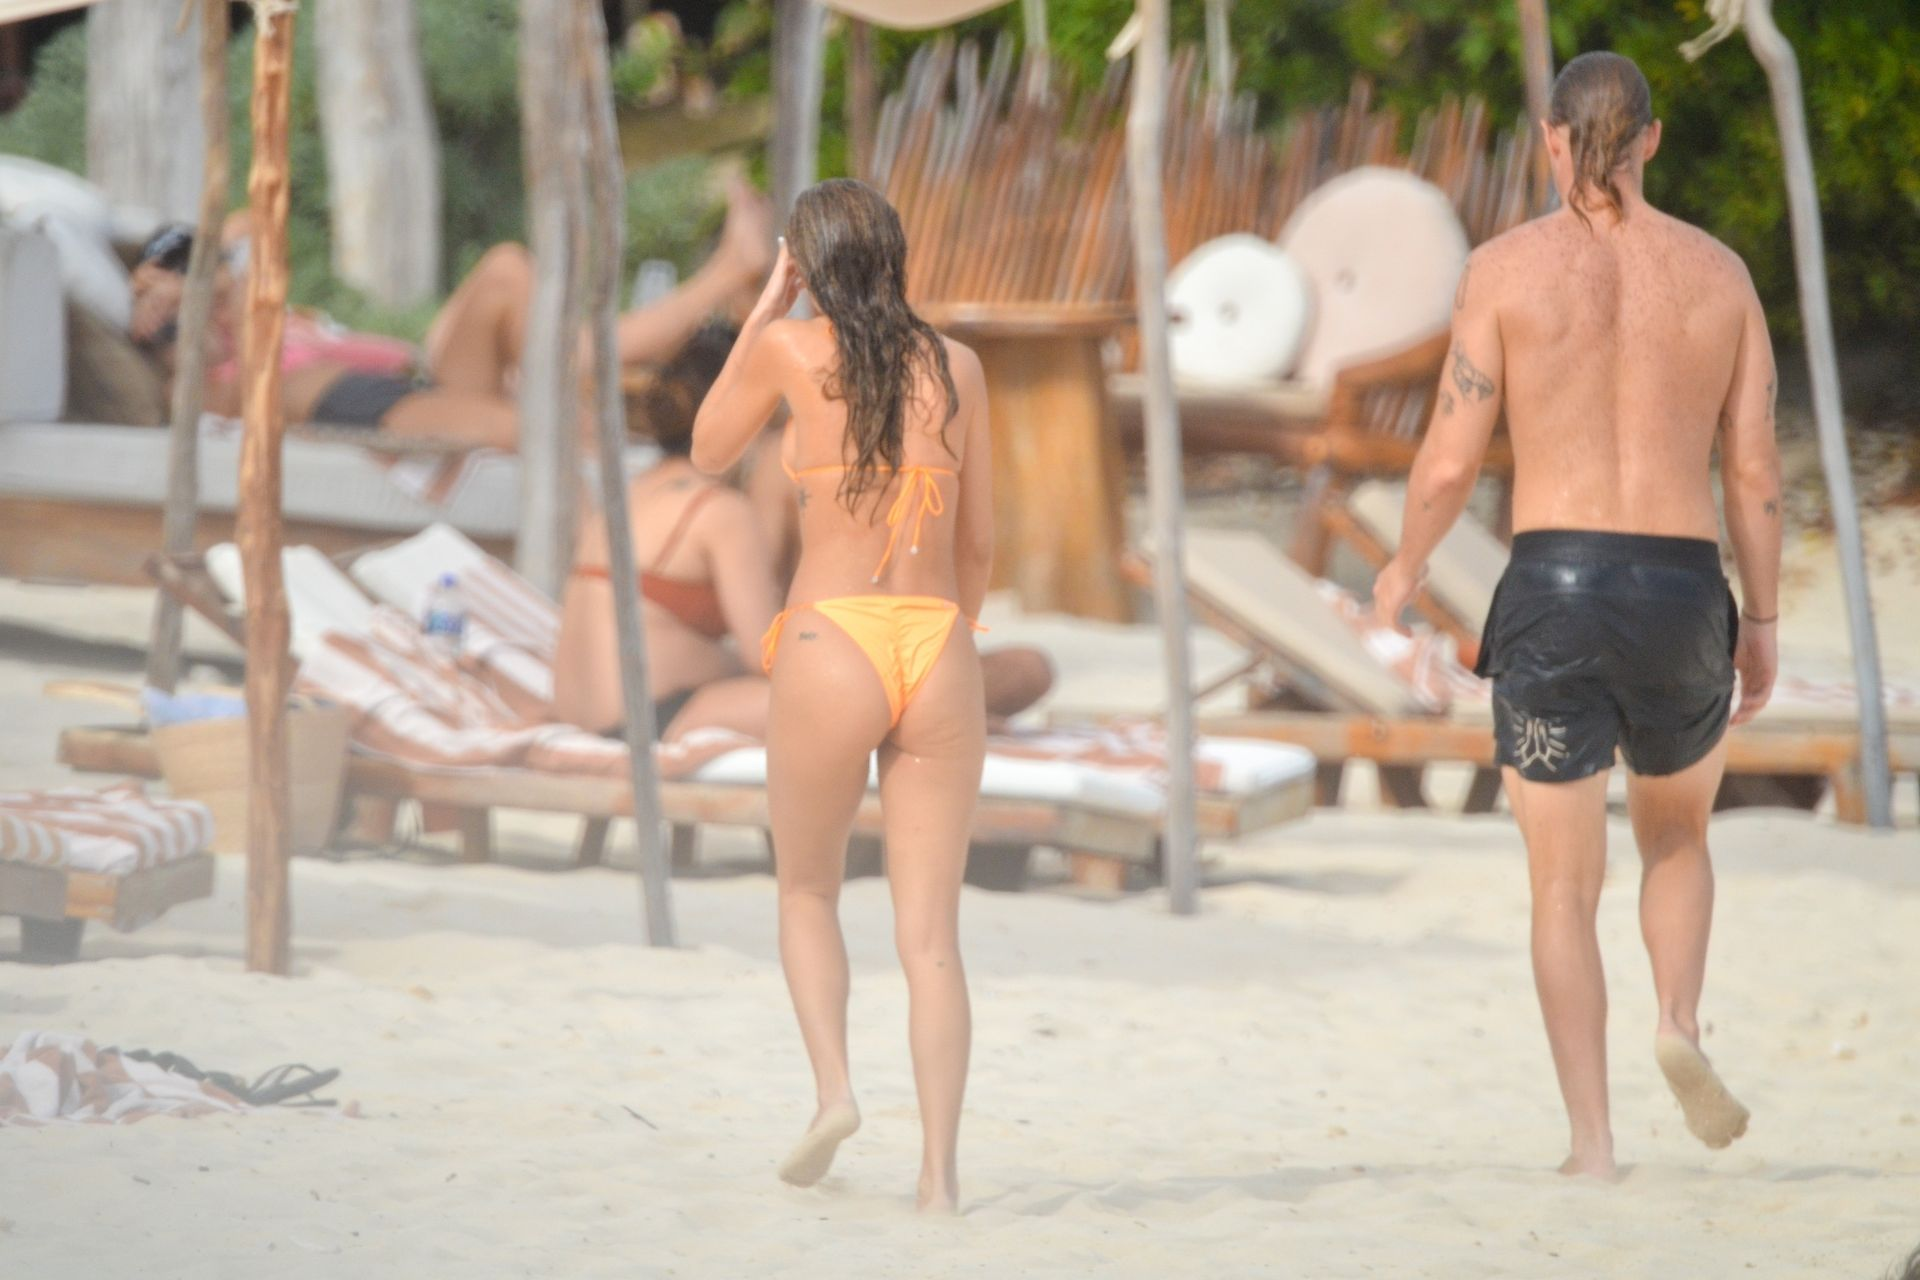 Chantel Jeffries And Dj Diplo Take Their New Love To Mexico 0028